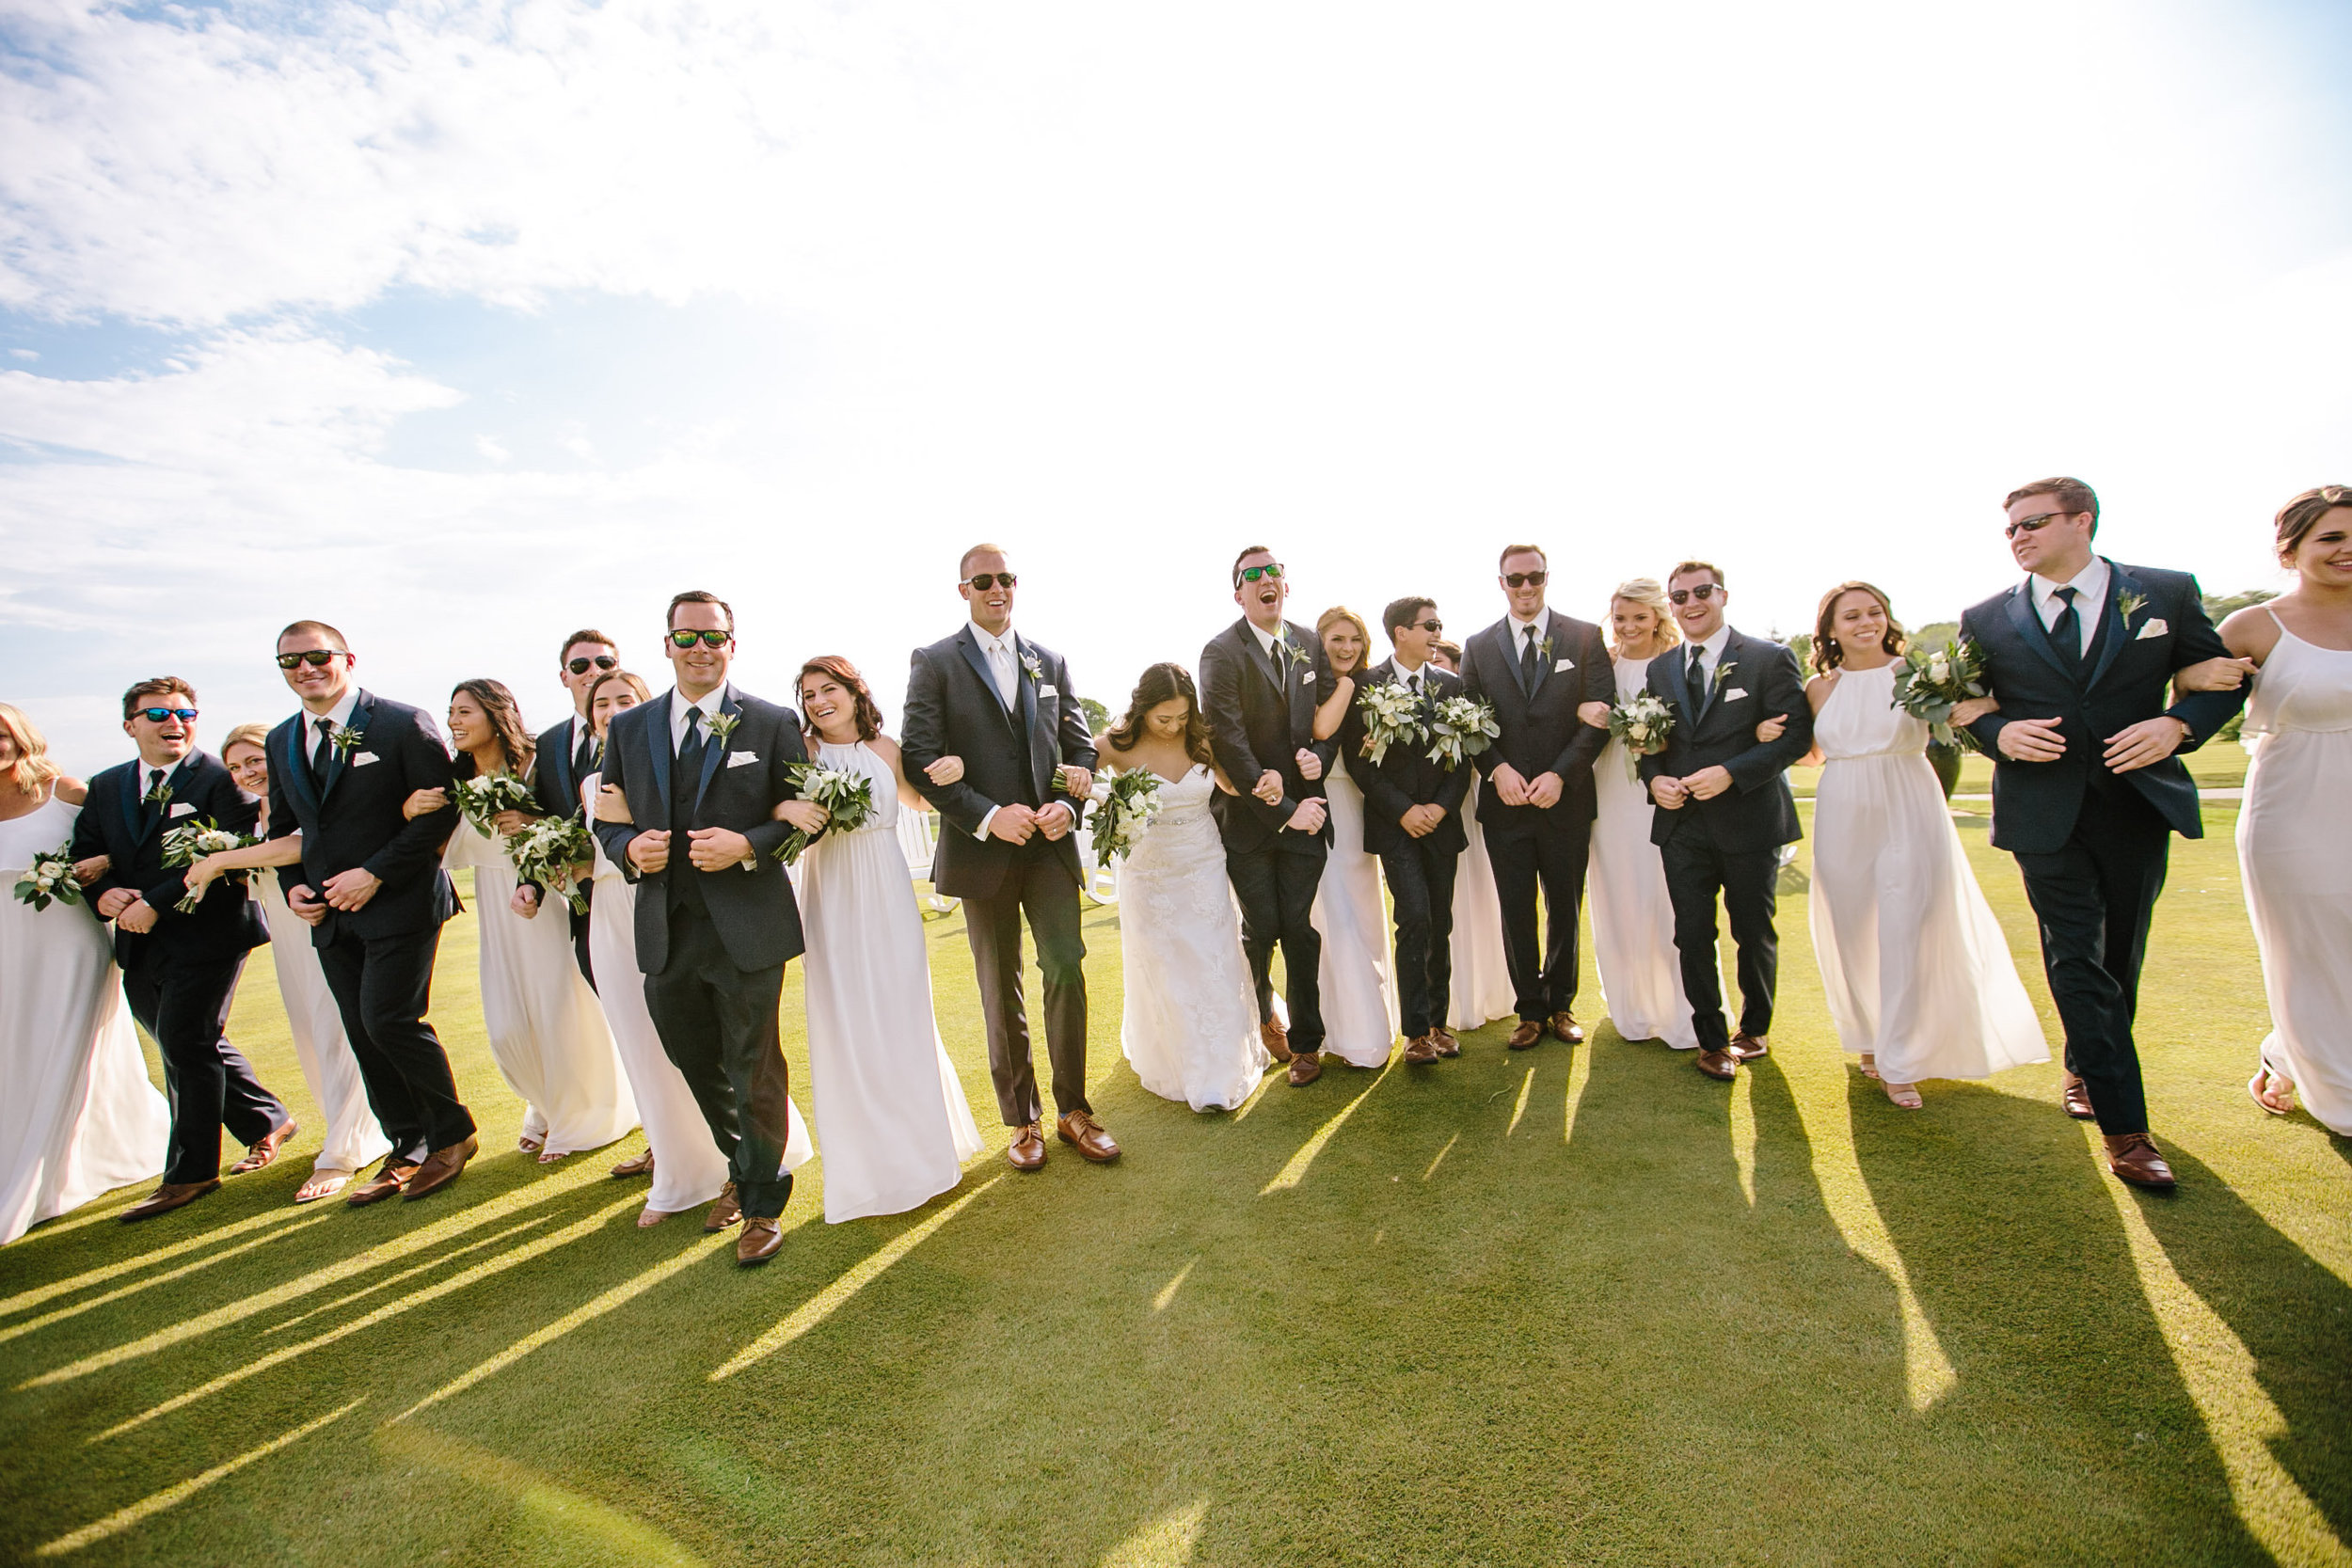 07 - Bridal Party-0675.jpg